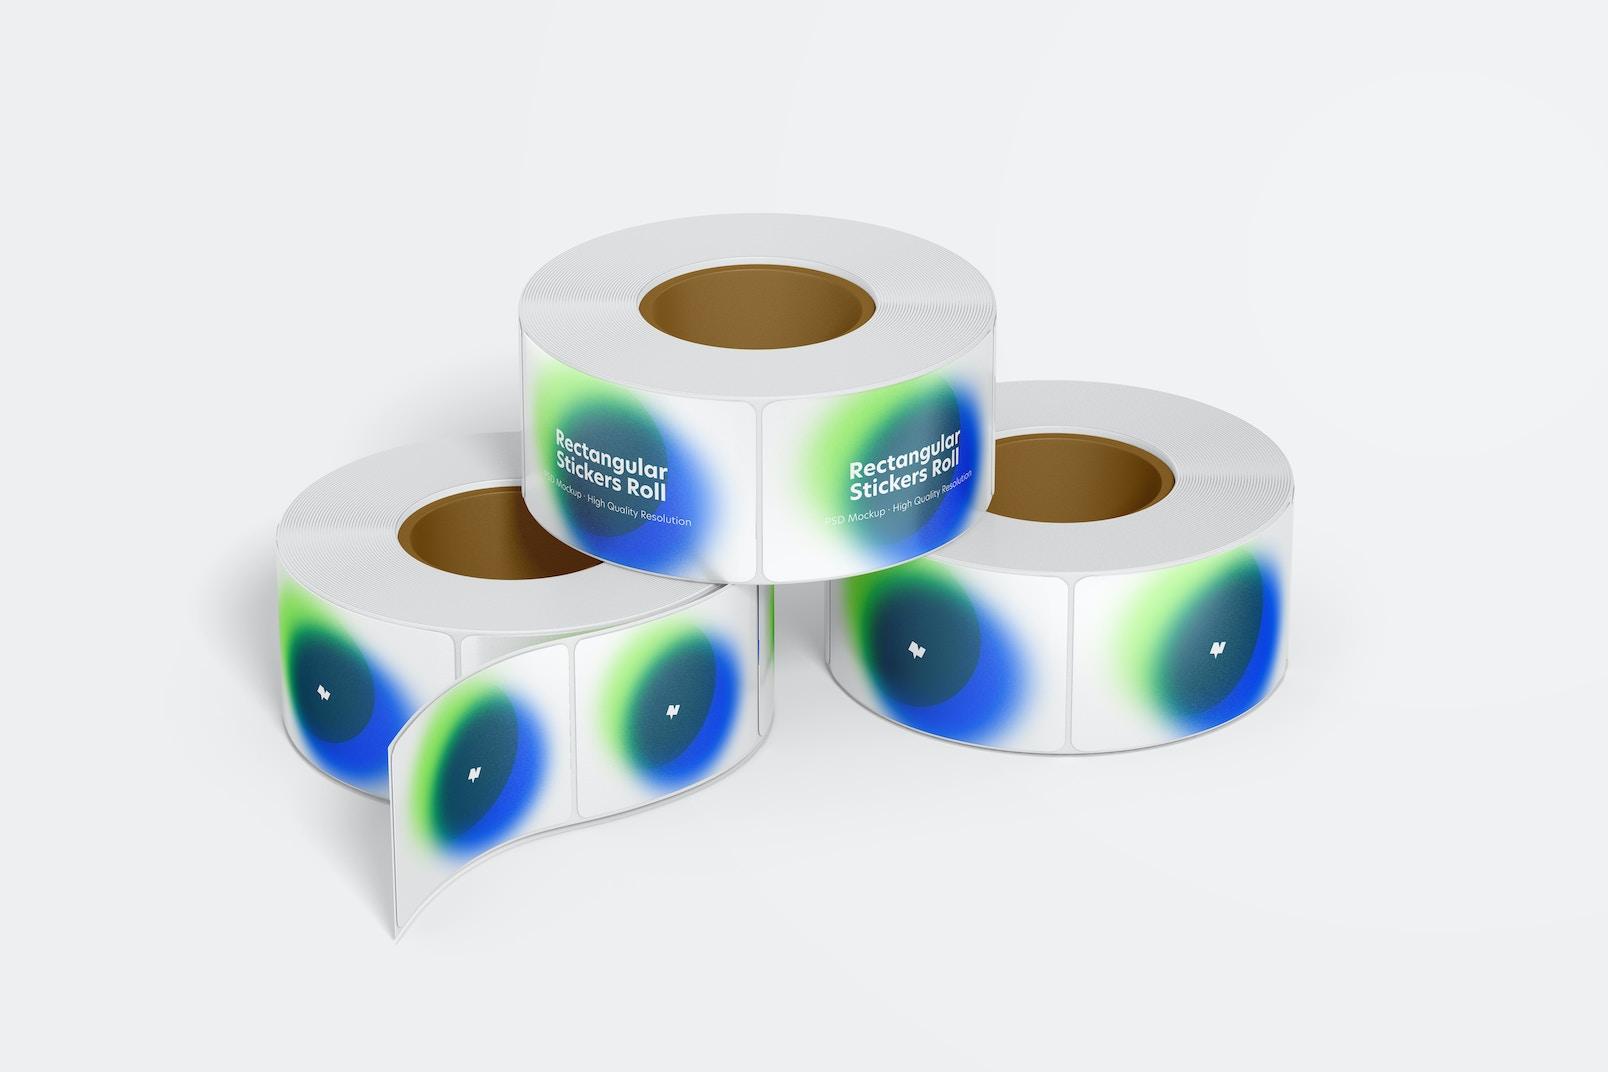 Rectangular Stickers Rolls Mockup